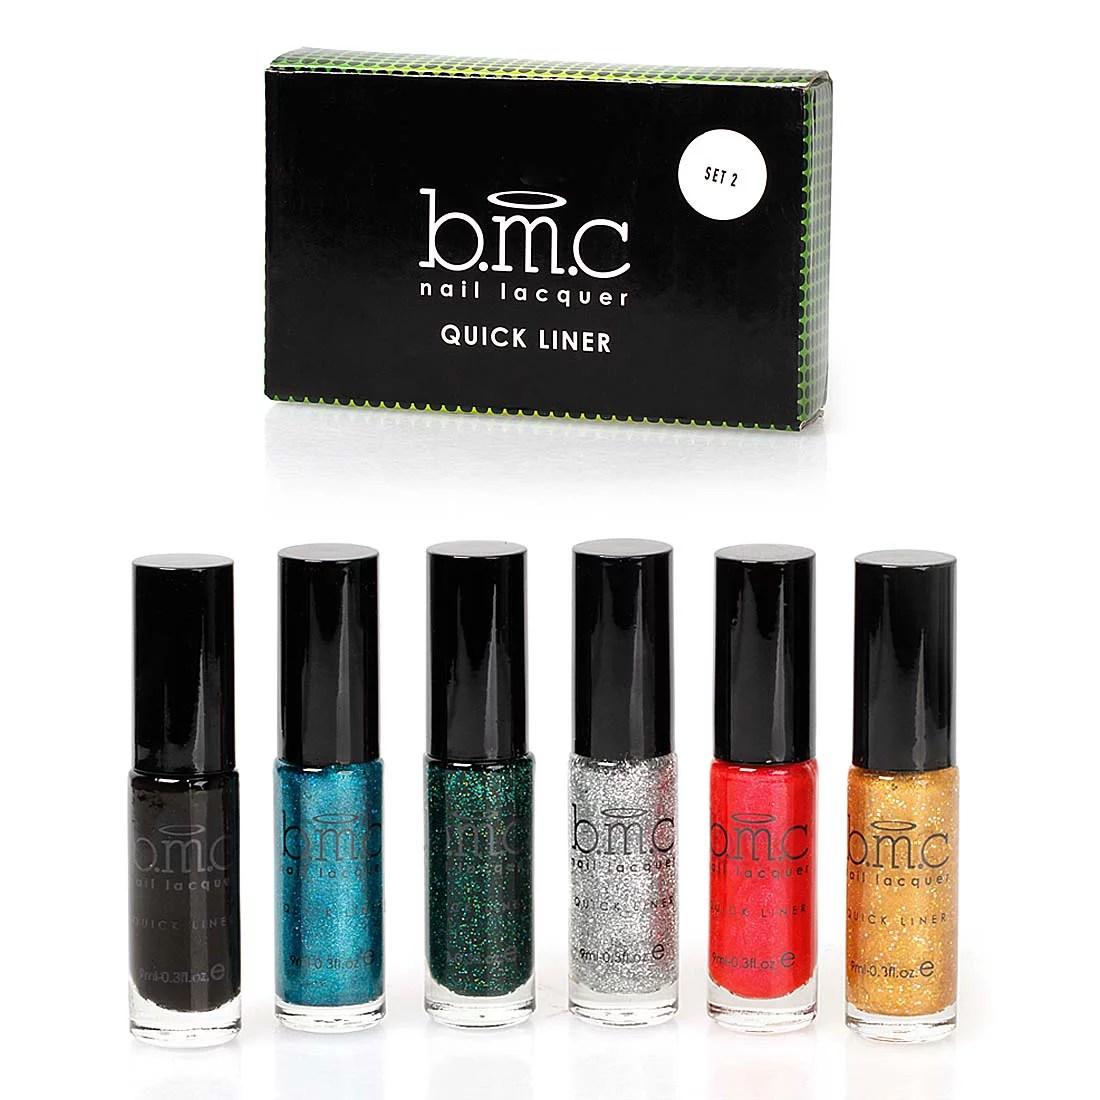 Bmc 6pc Long Striper Dotting Brush Diy Nail Art Polishes Quick Liner Sets Walmart